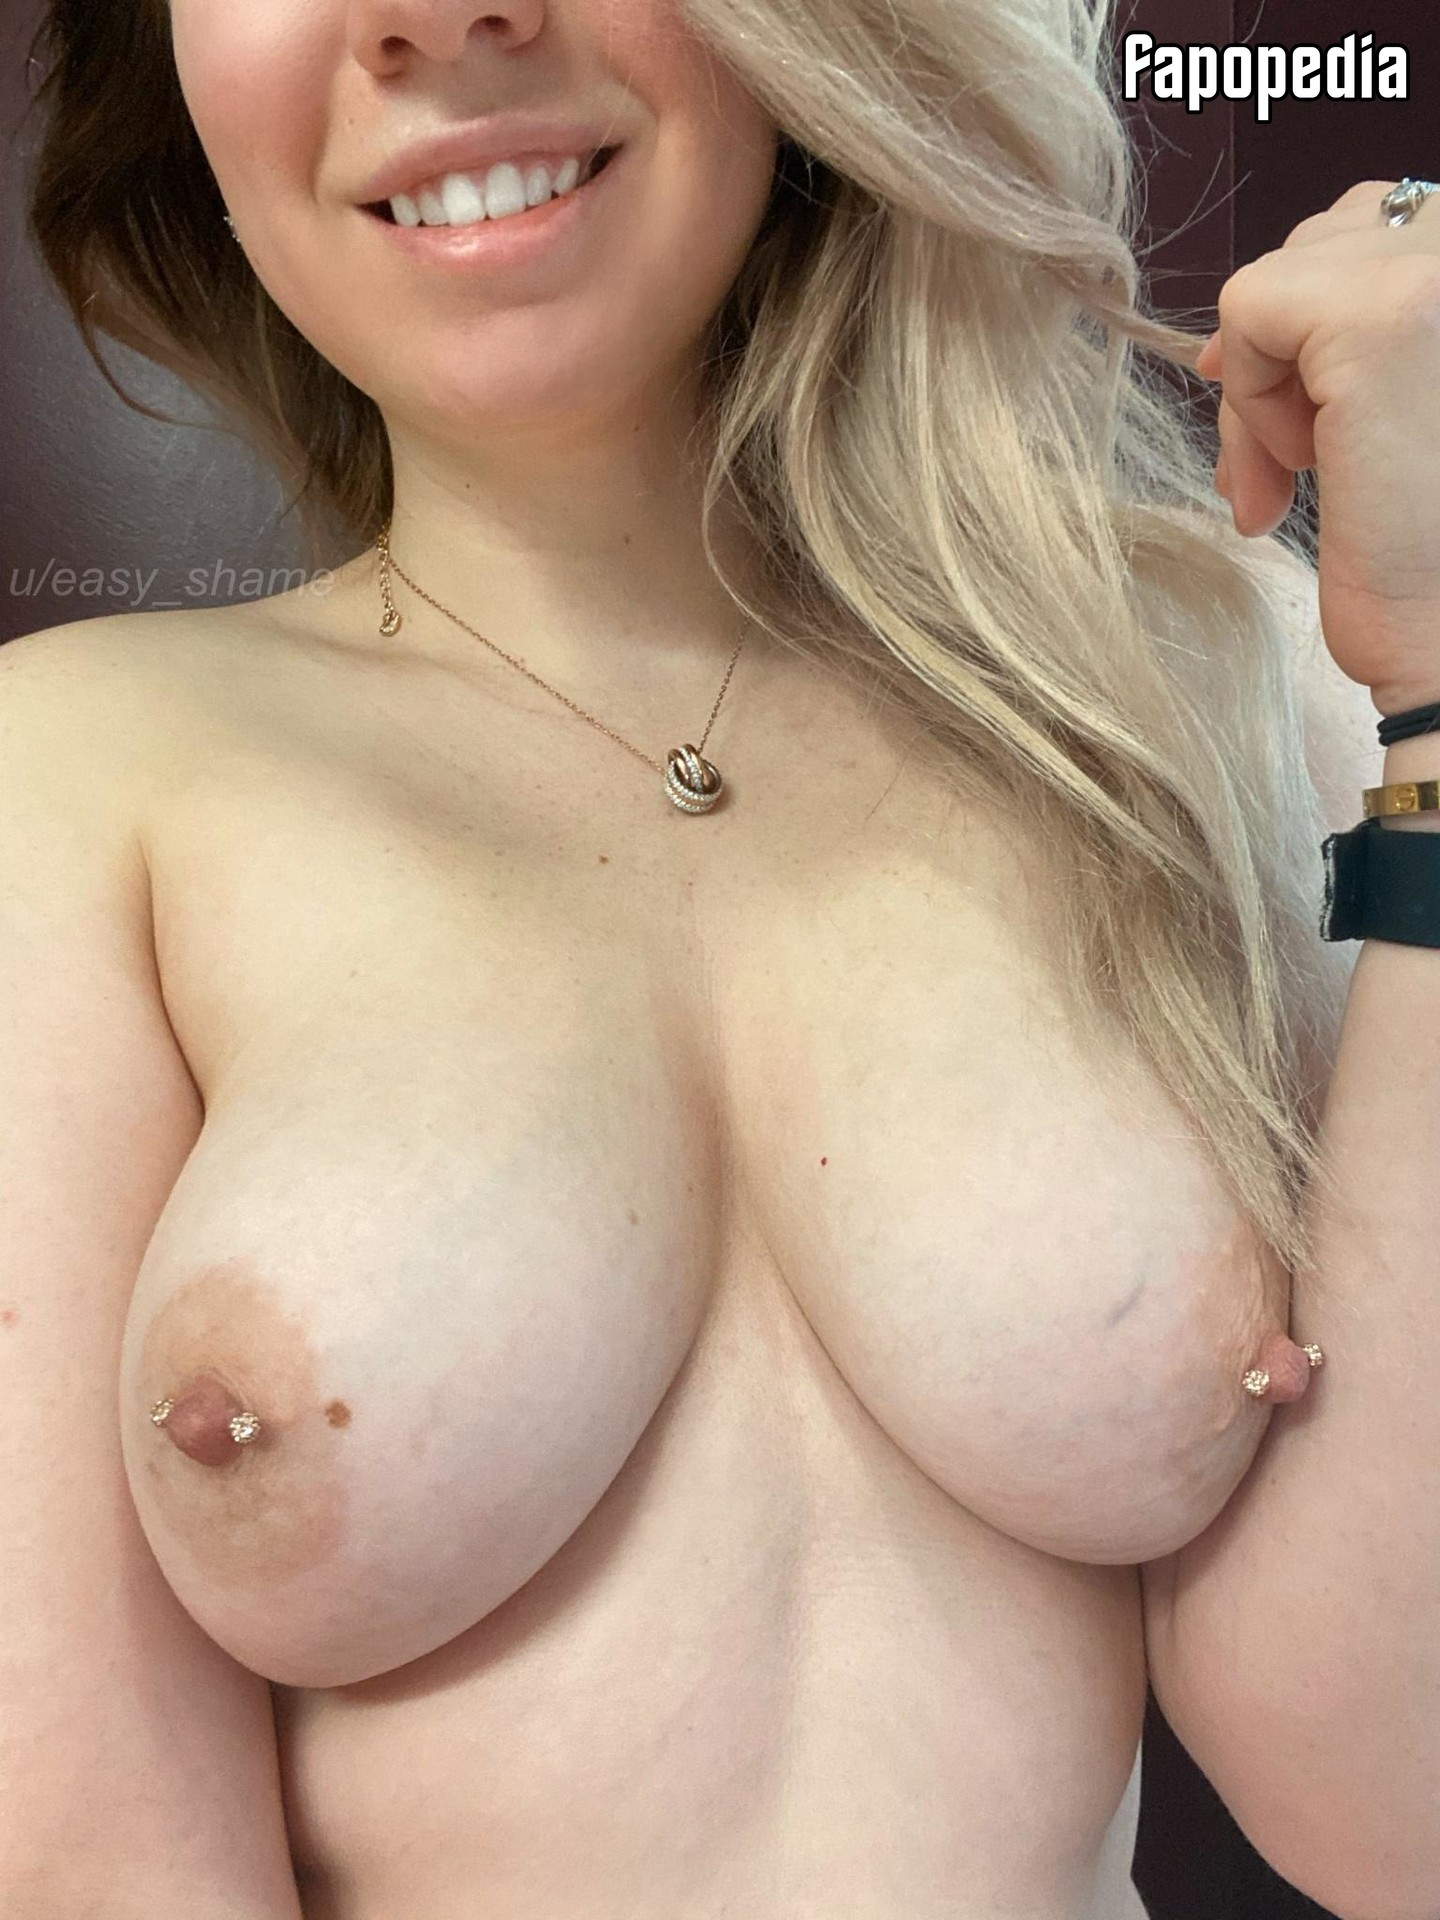 Easy_Shame Nude Leaks